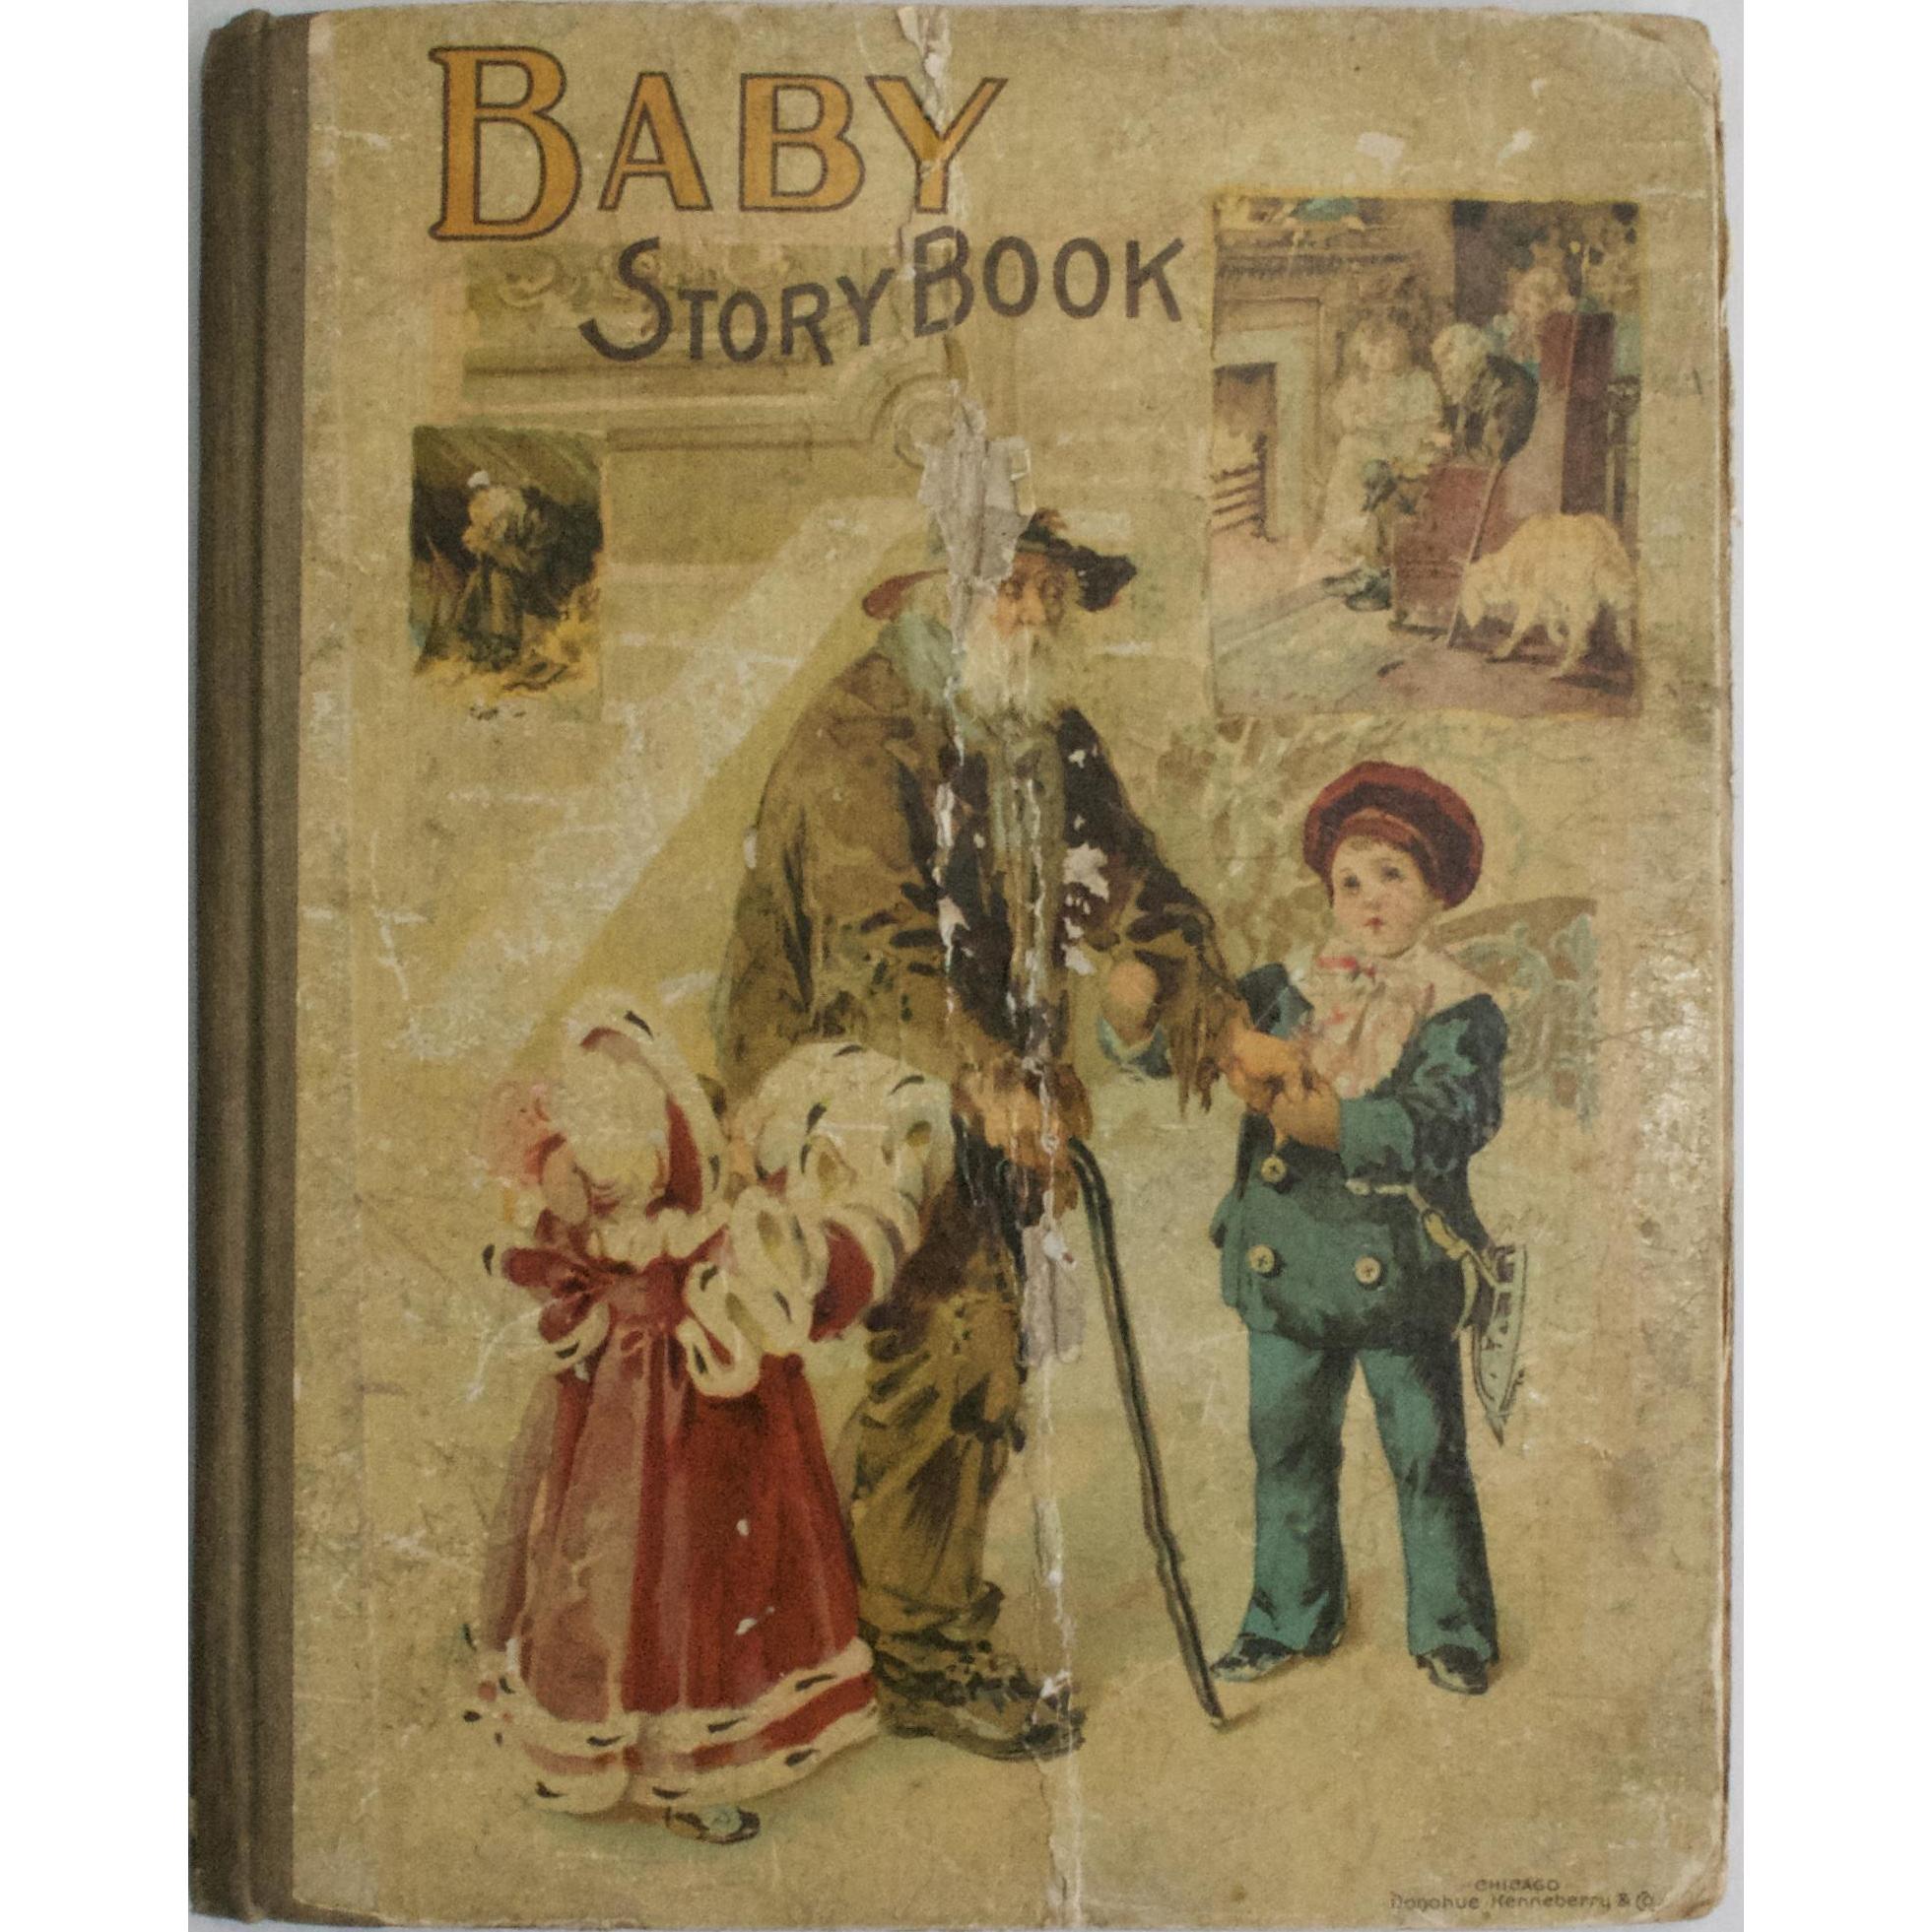 Rare Circa 1896 Baby Storybook Victorian Era Illustrated